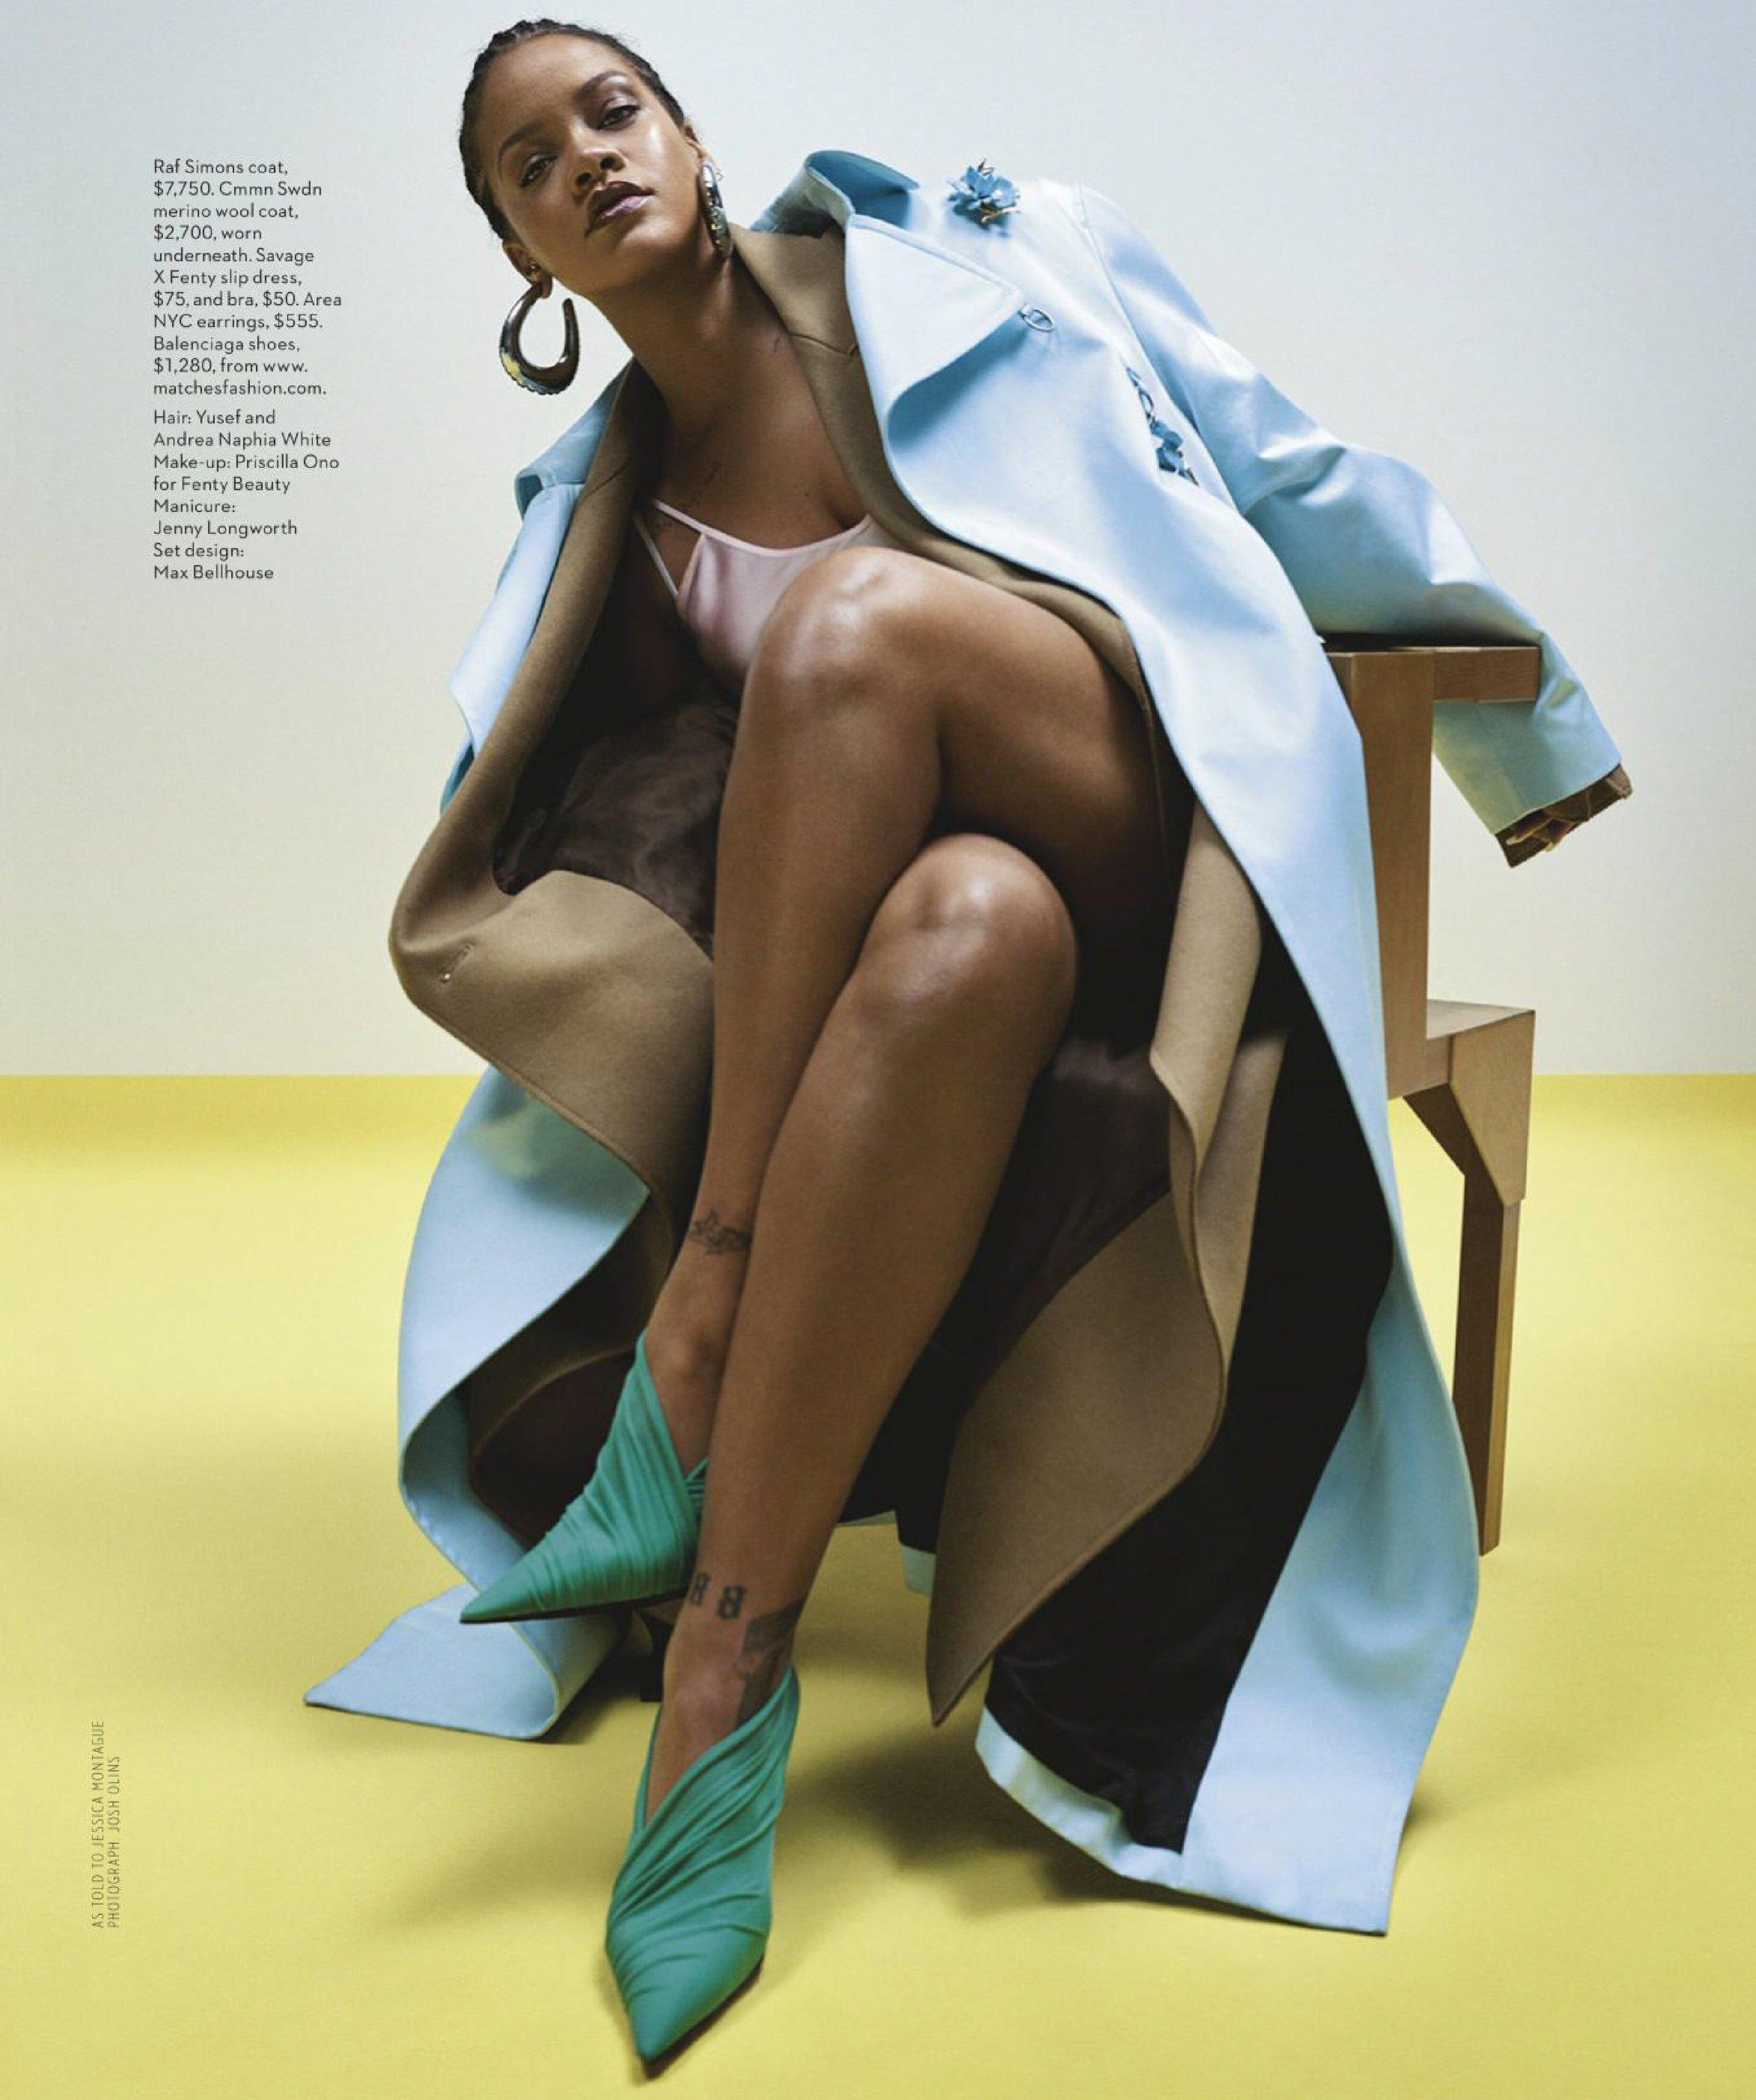 Rihanna-Josh-Olins-Vogue-Australia-May-2019- (1).jpg